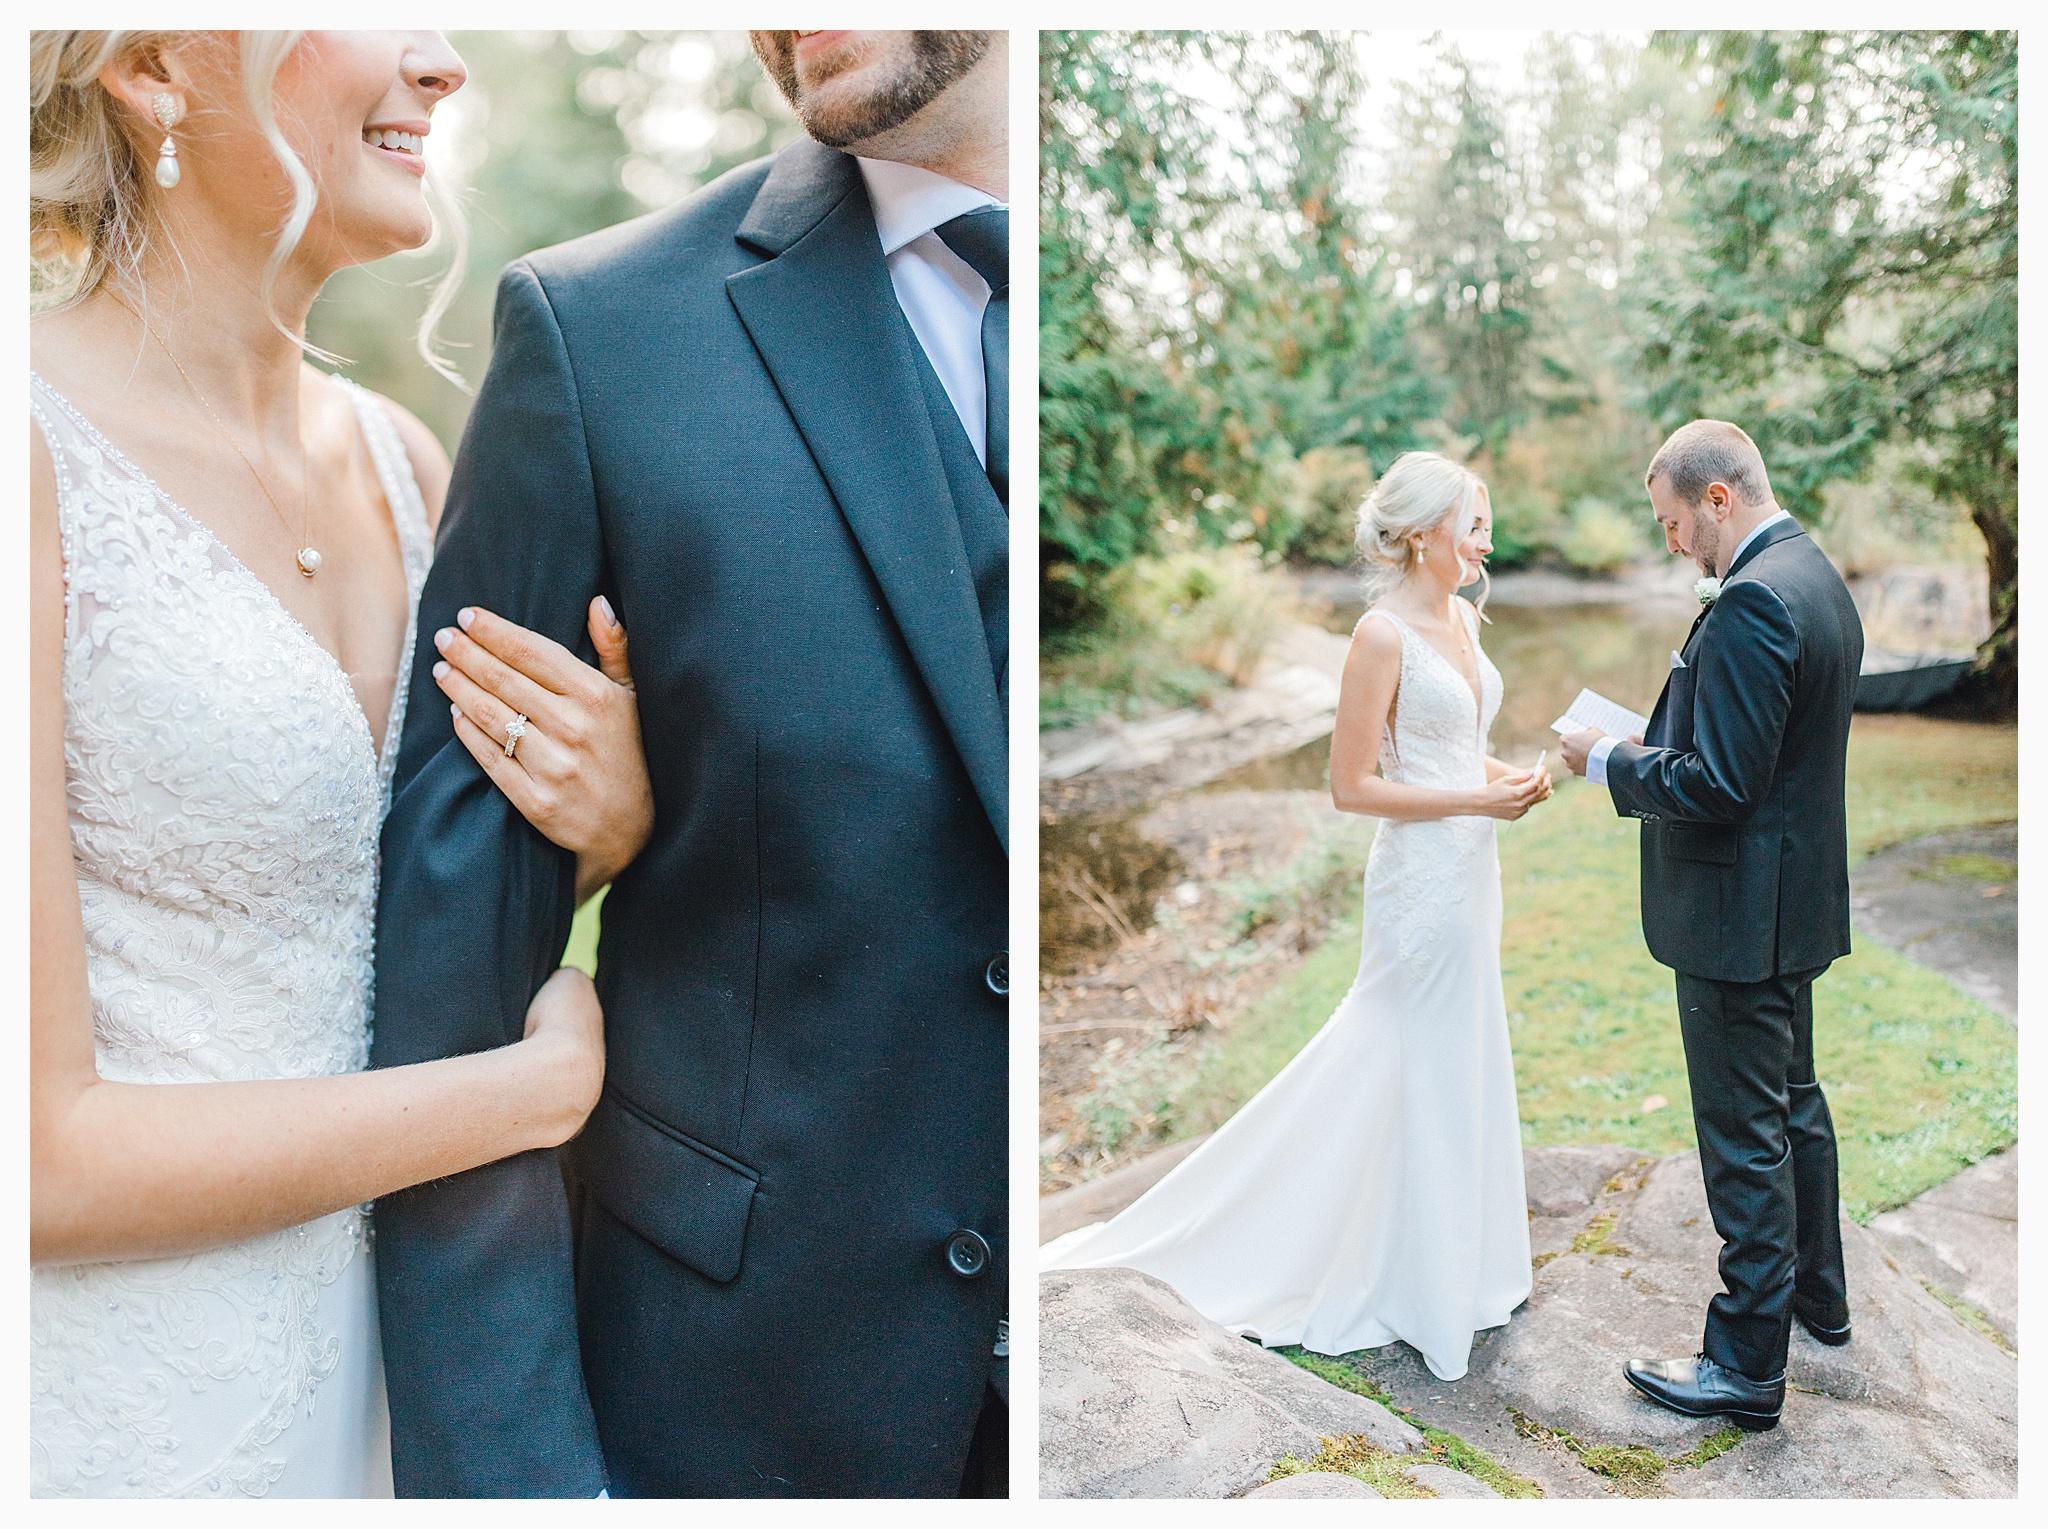 Emma Rose Company Light and Airy Wedding Photographer, Beautiful fall wedding at Rock Creek Gardens Venue in Puyallup, Washington._0027.jpg